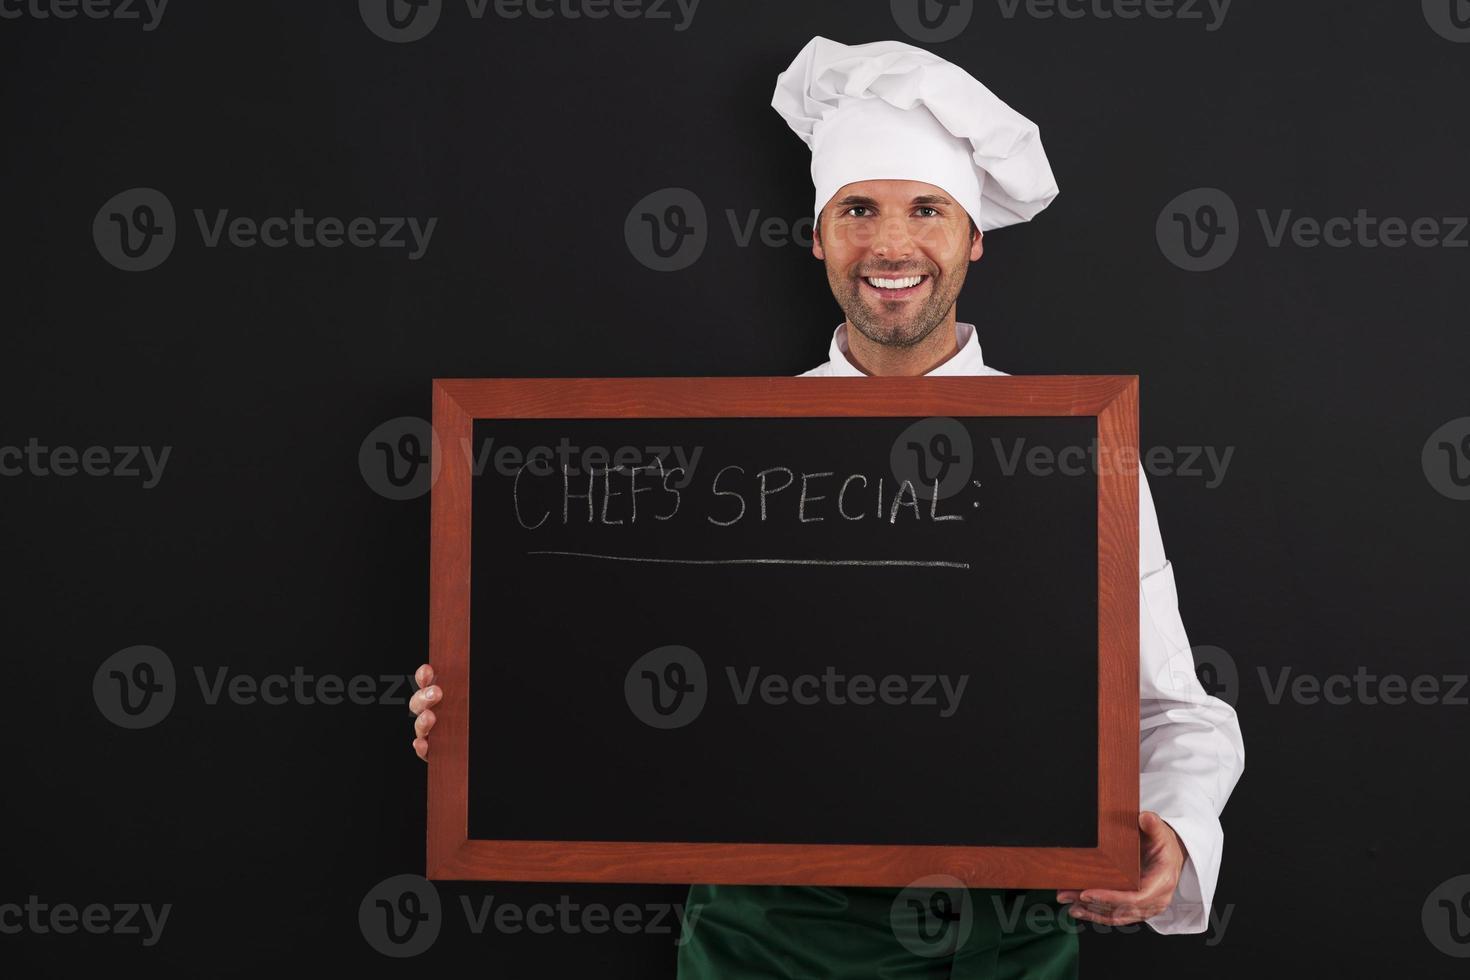 especial del chef foto